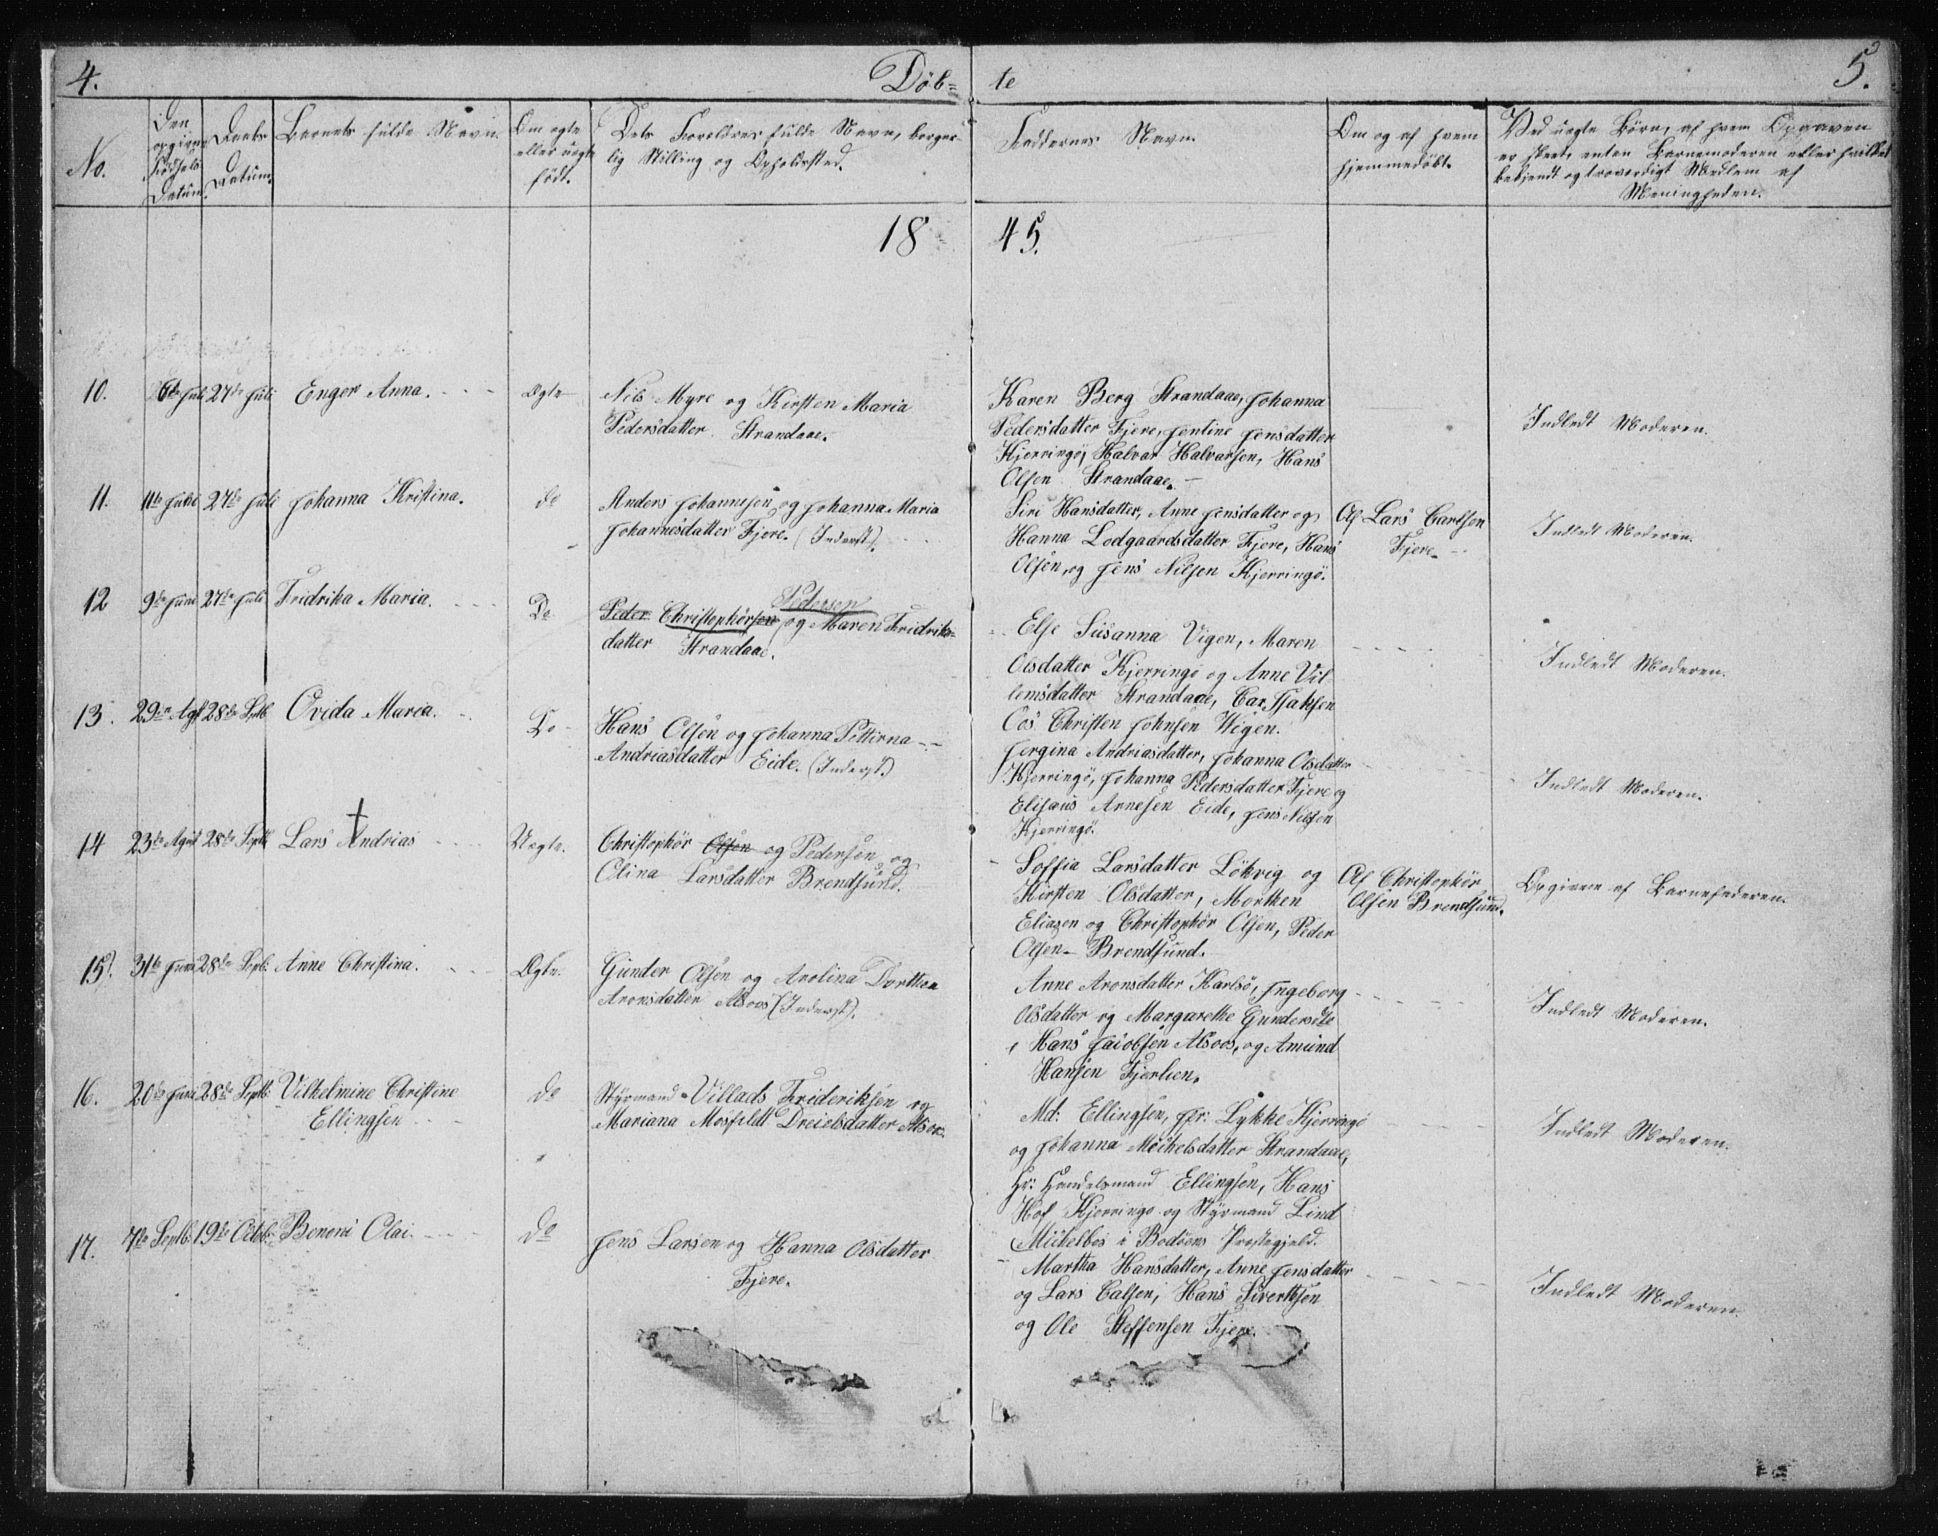 SAT, Ministerialprotokoller, klokkerbøker og fødselsregistre - Nordland, 803/L0074: Klokkerbok nr. 803C01, 1845-1866, s. 4-5